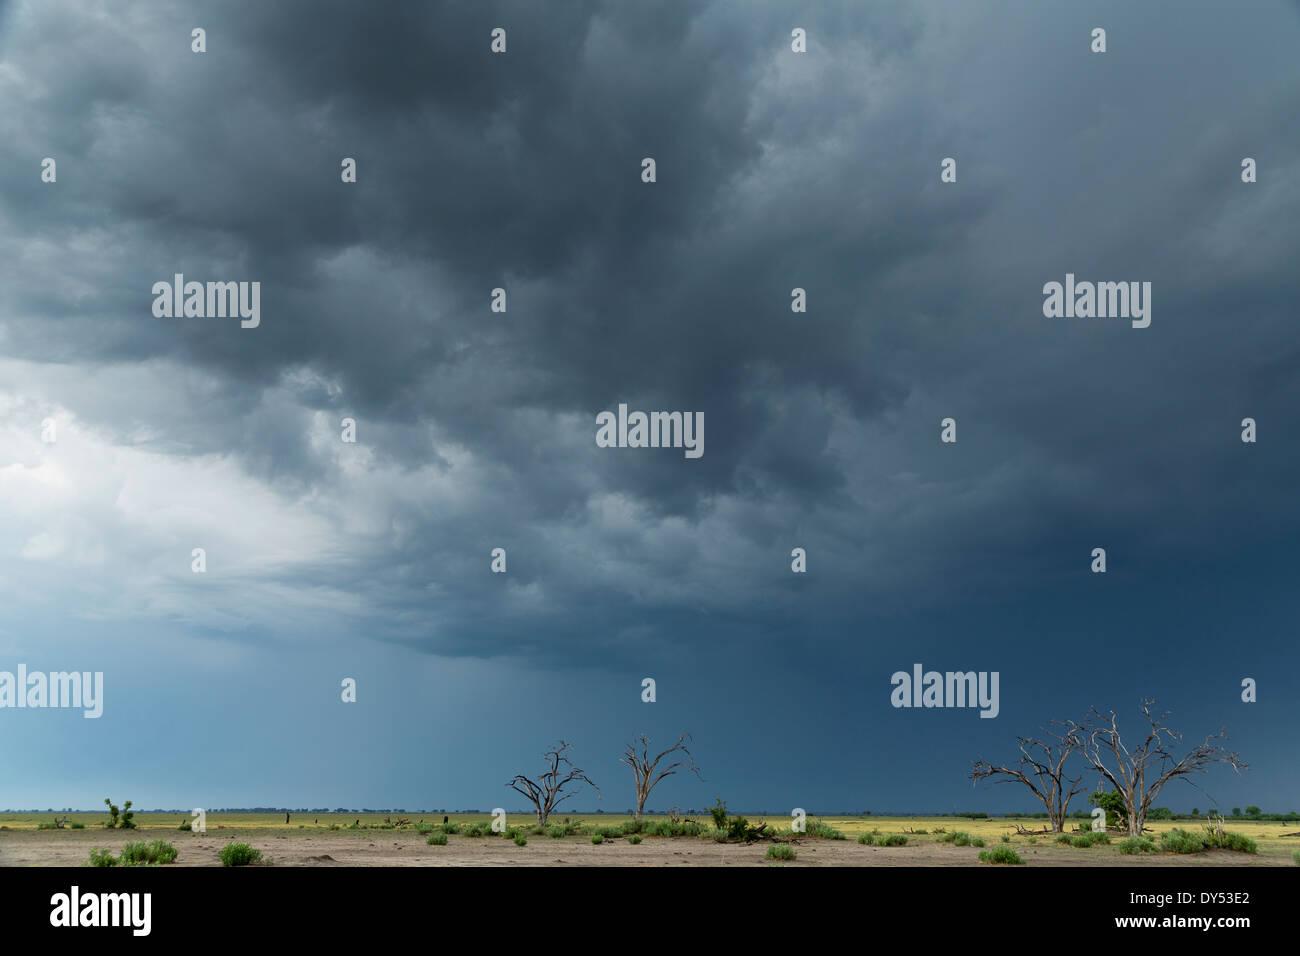 Storm clouds over landscape, Kasane, Chobe National Park, Botswana, Africa - Stock Image